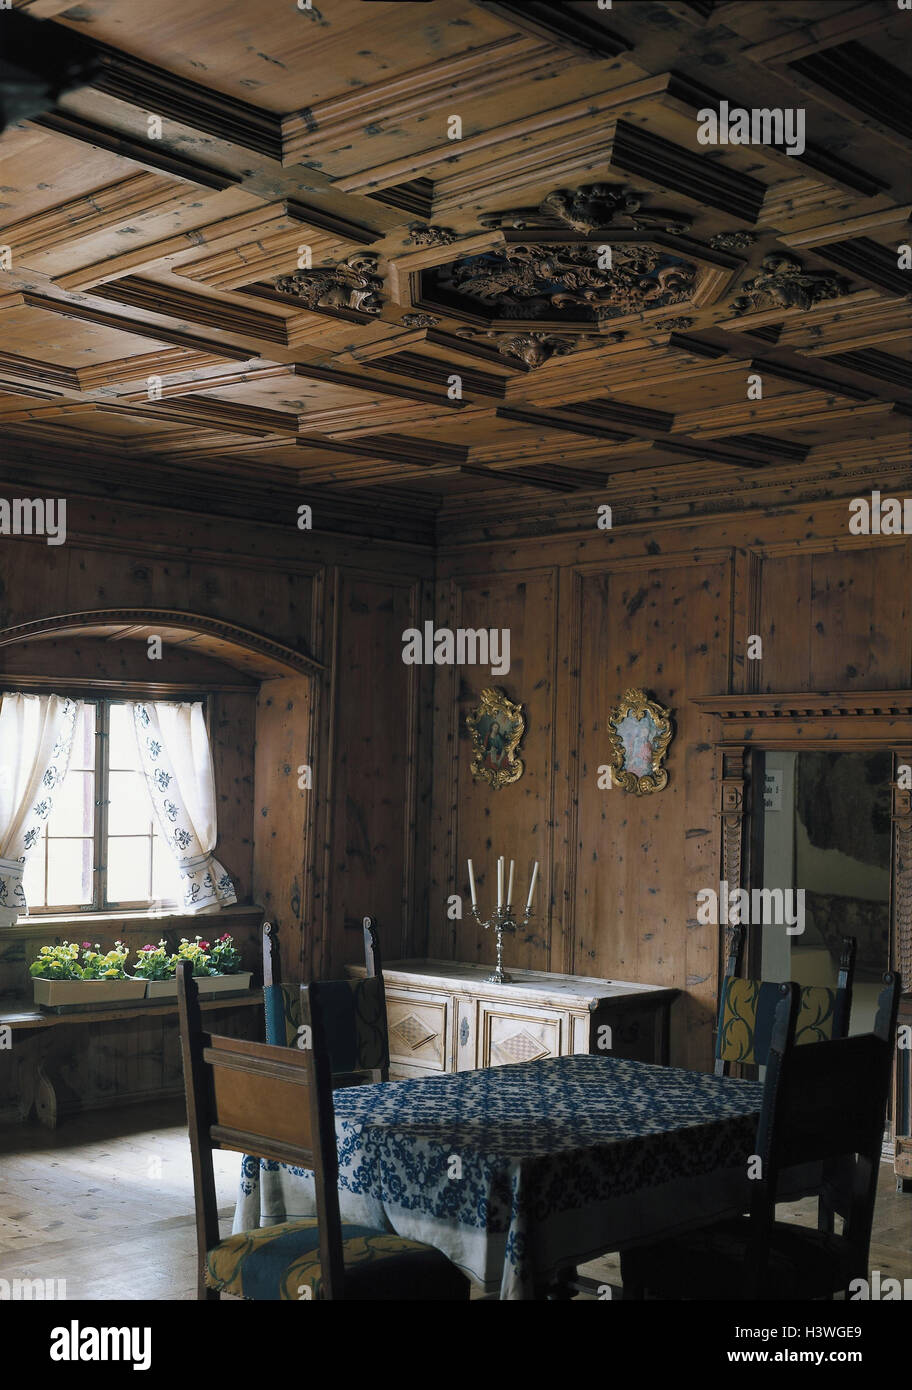 Holzvertäfelung switzerland cloister müstair prince s room detail living space